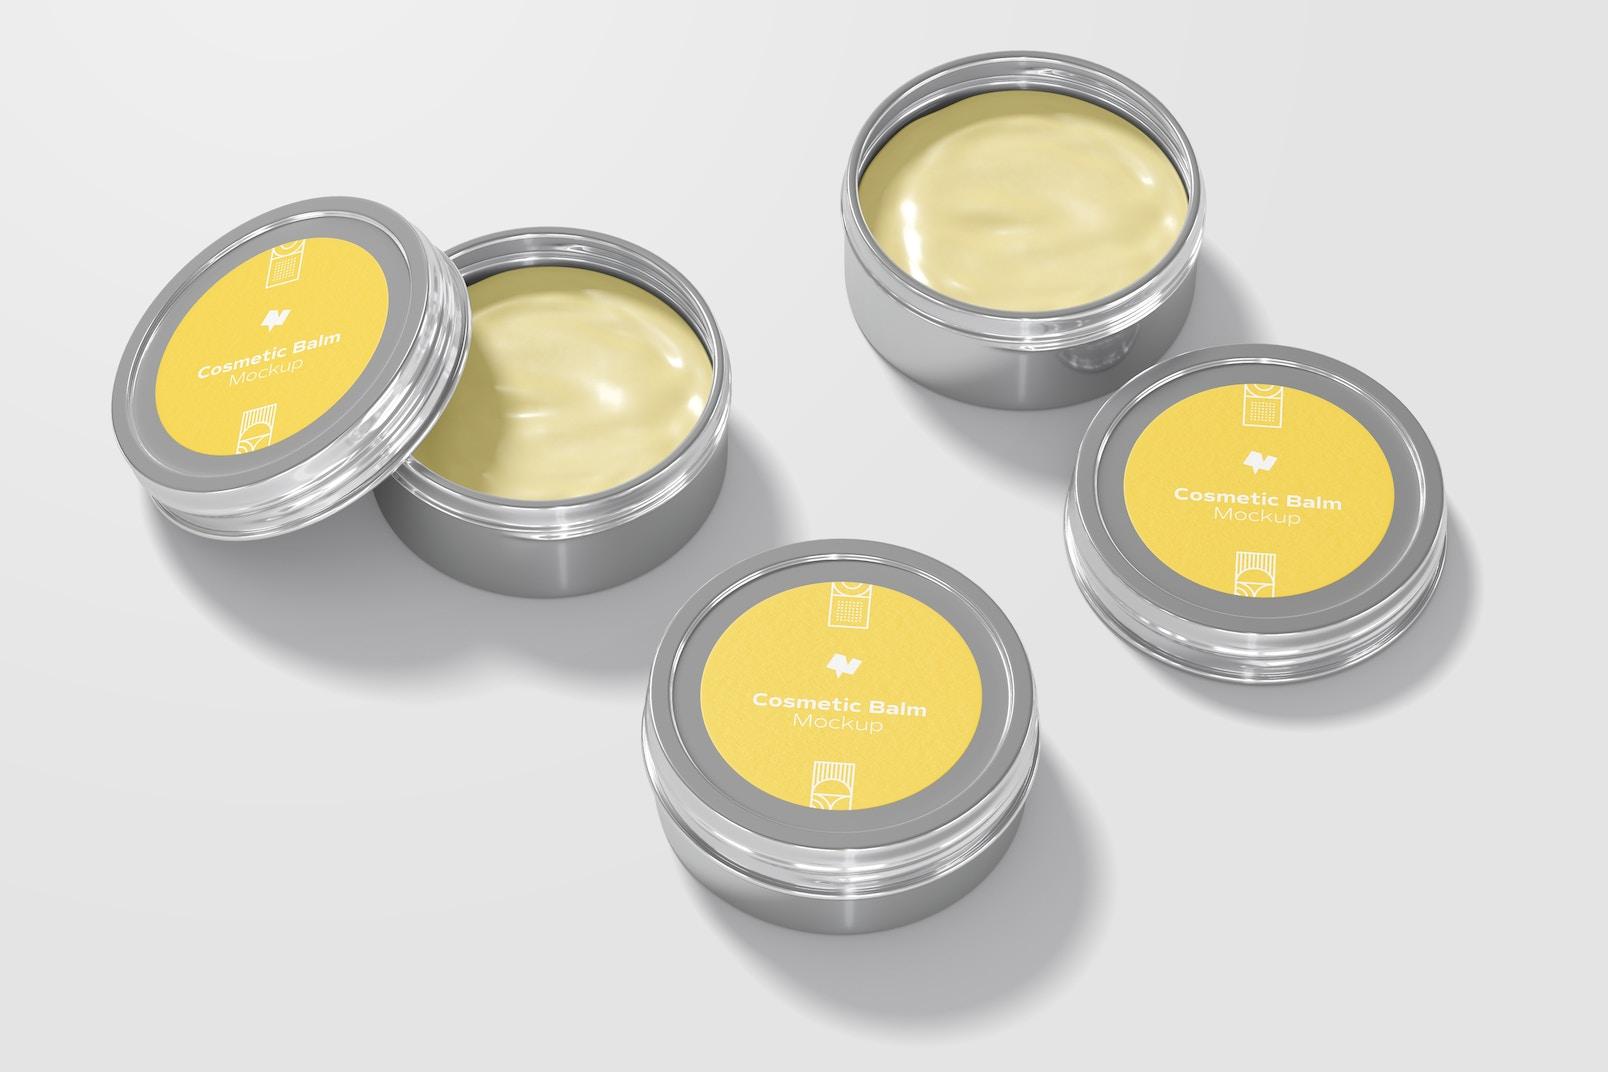 Metallic Cosmetic Balm Packaging Set Mockup